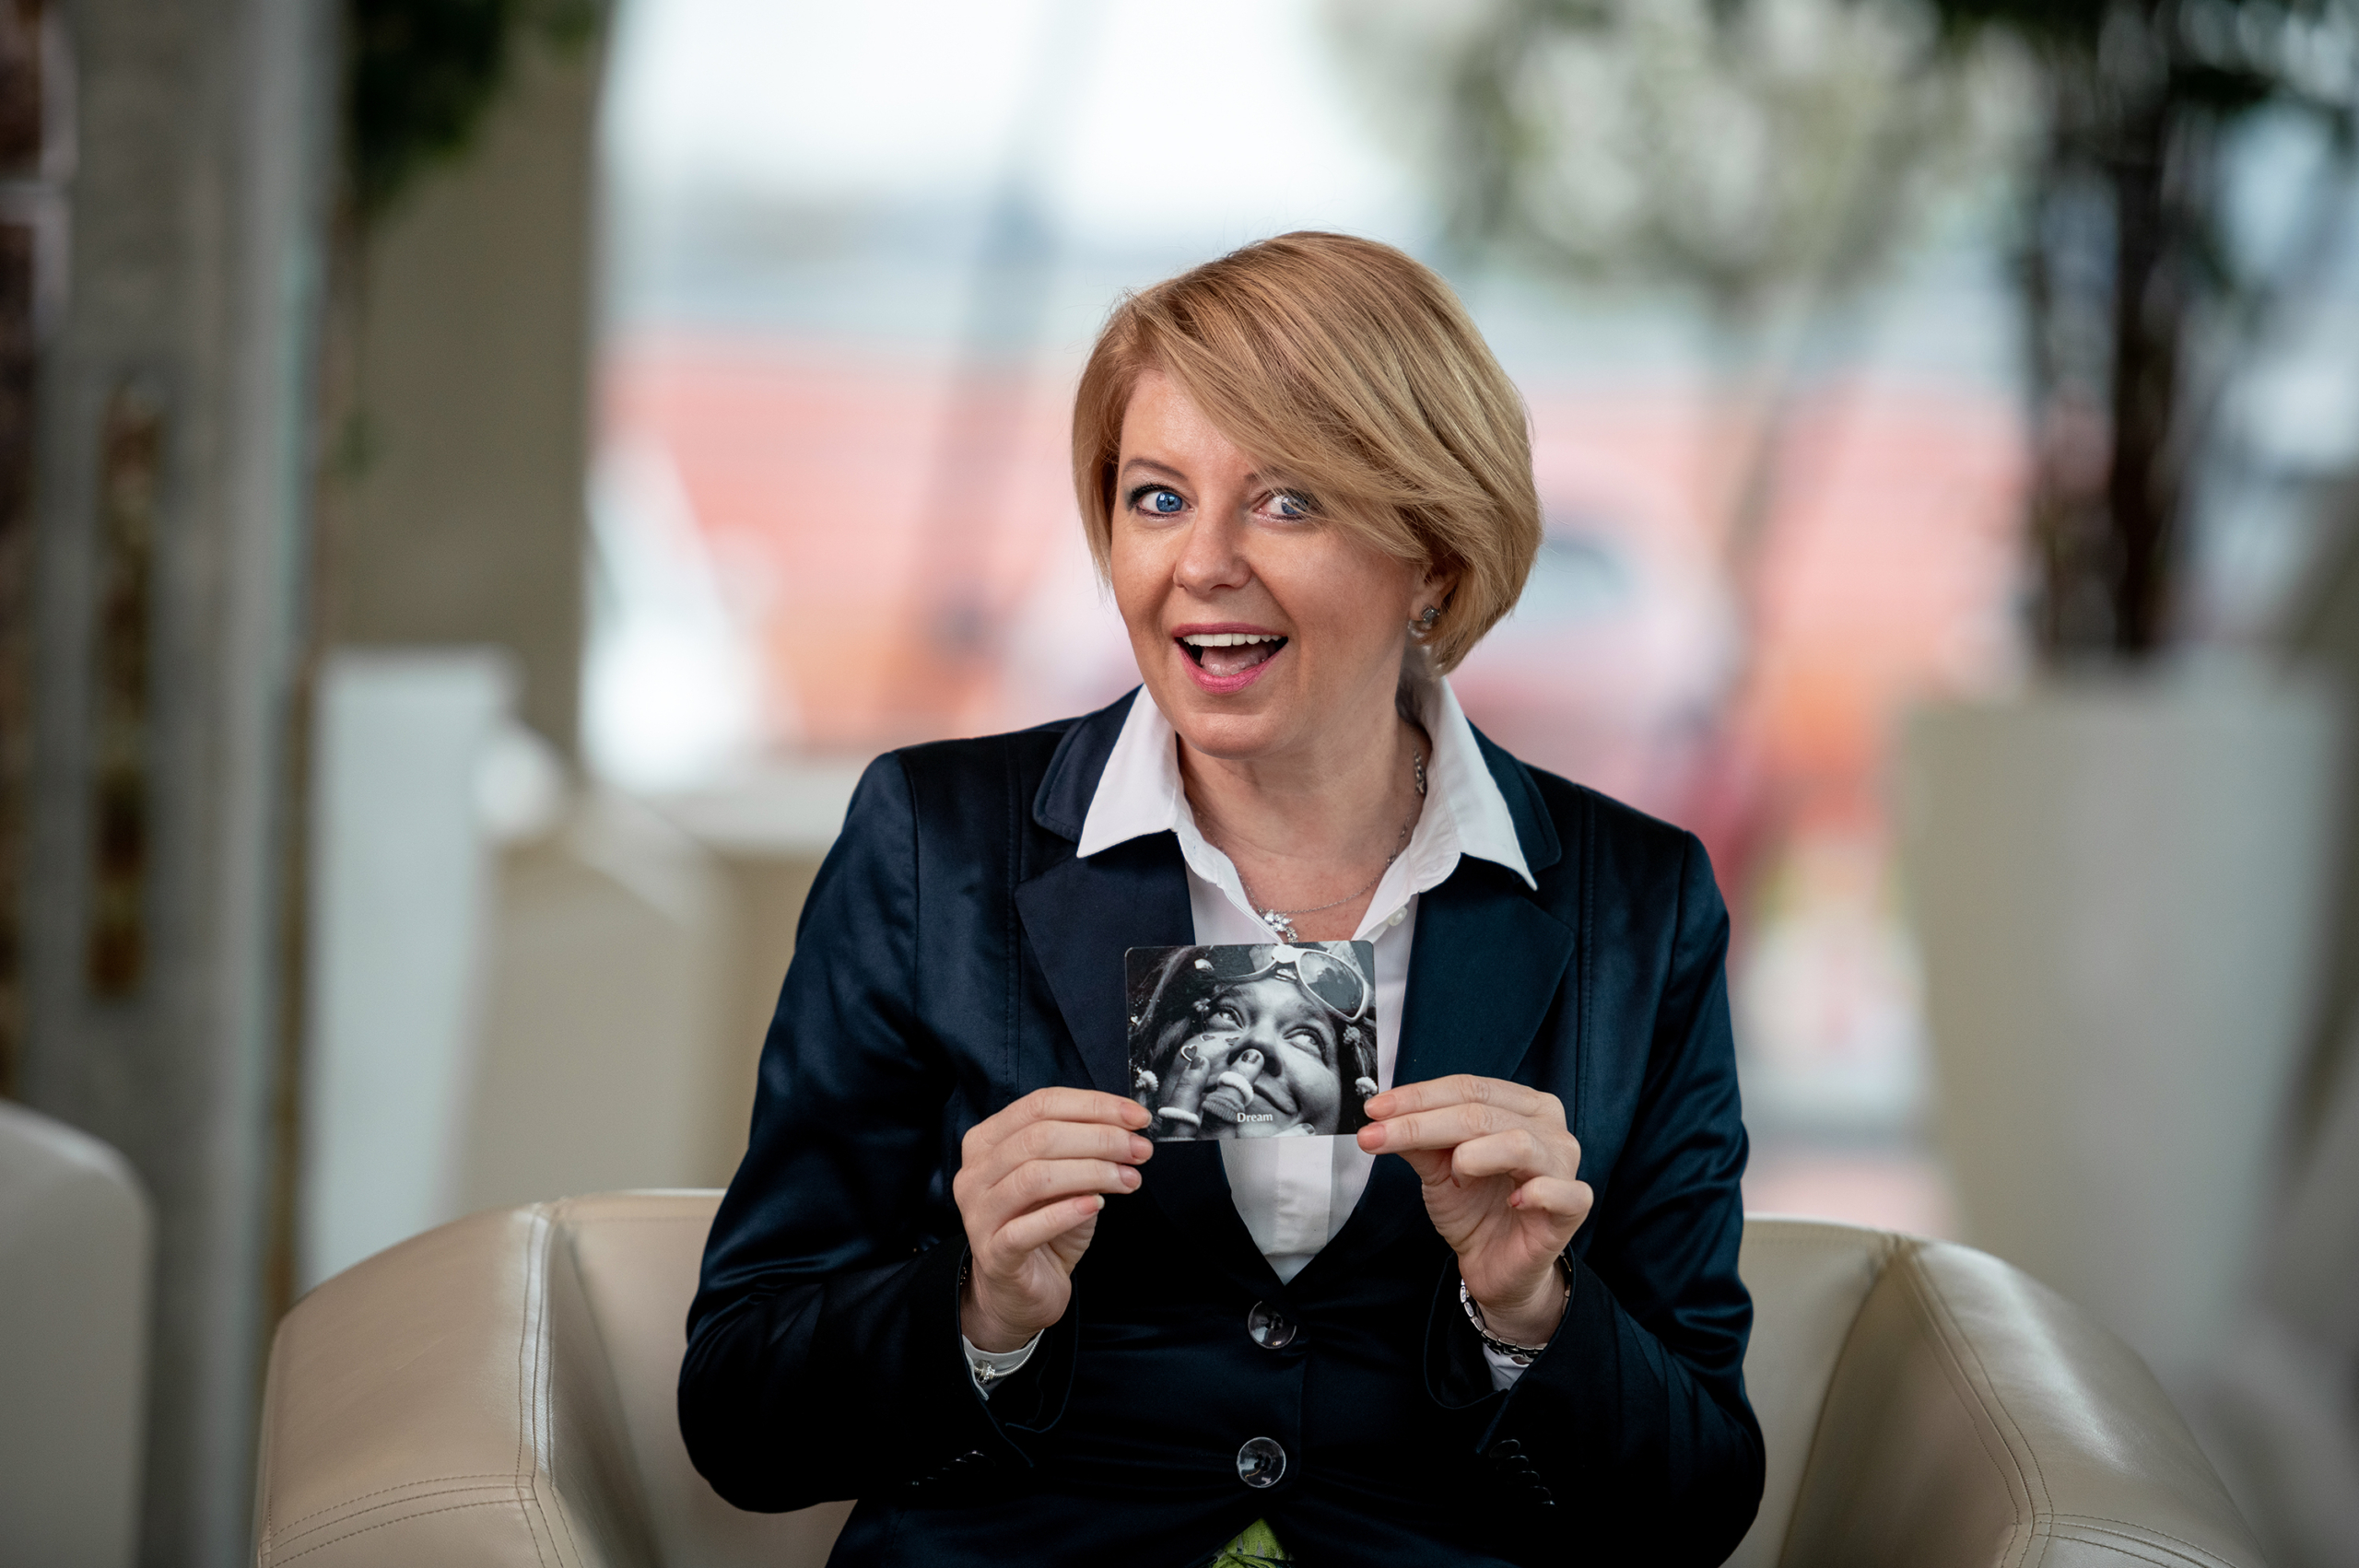 Irena Grofelnik: Coaching